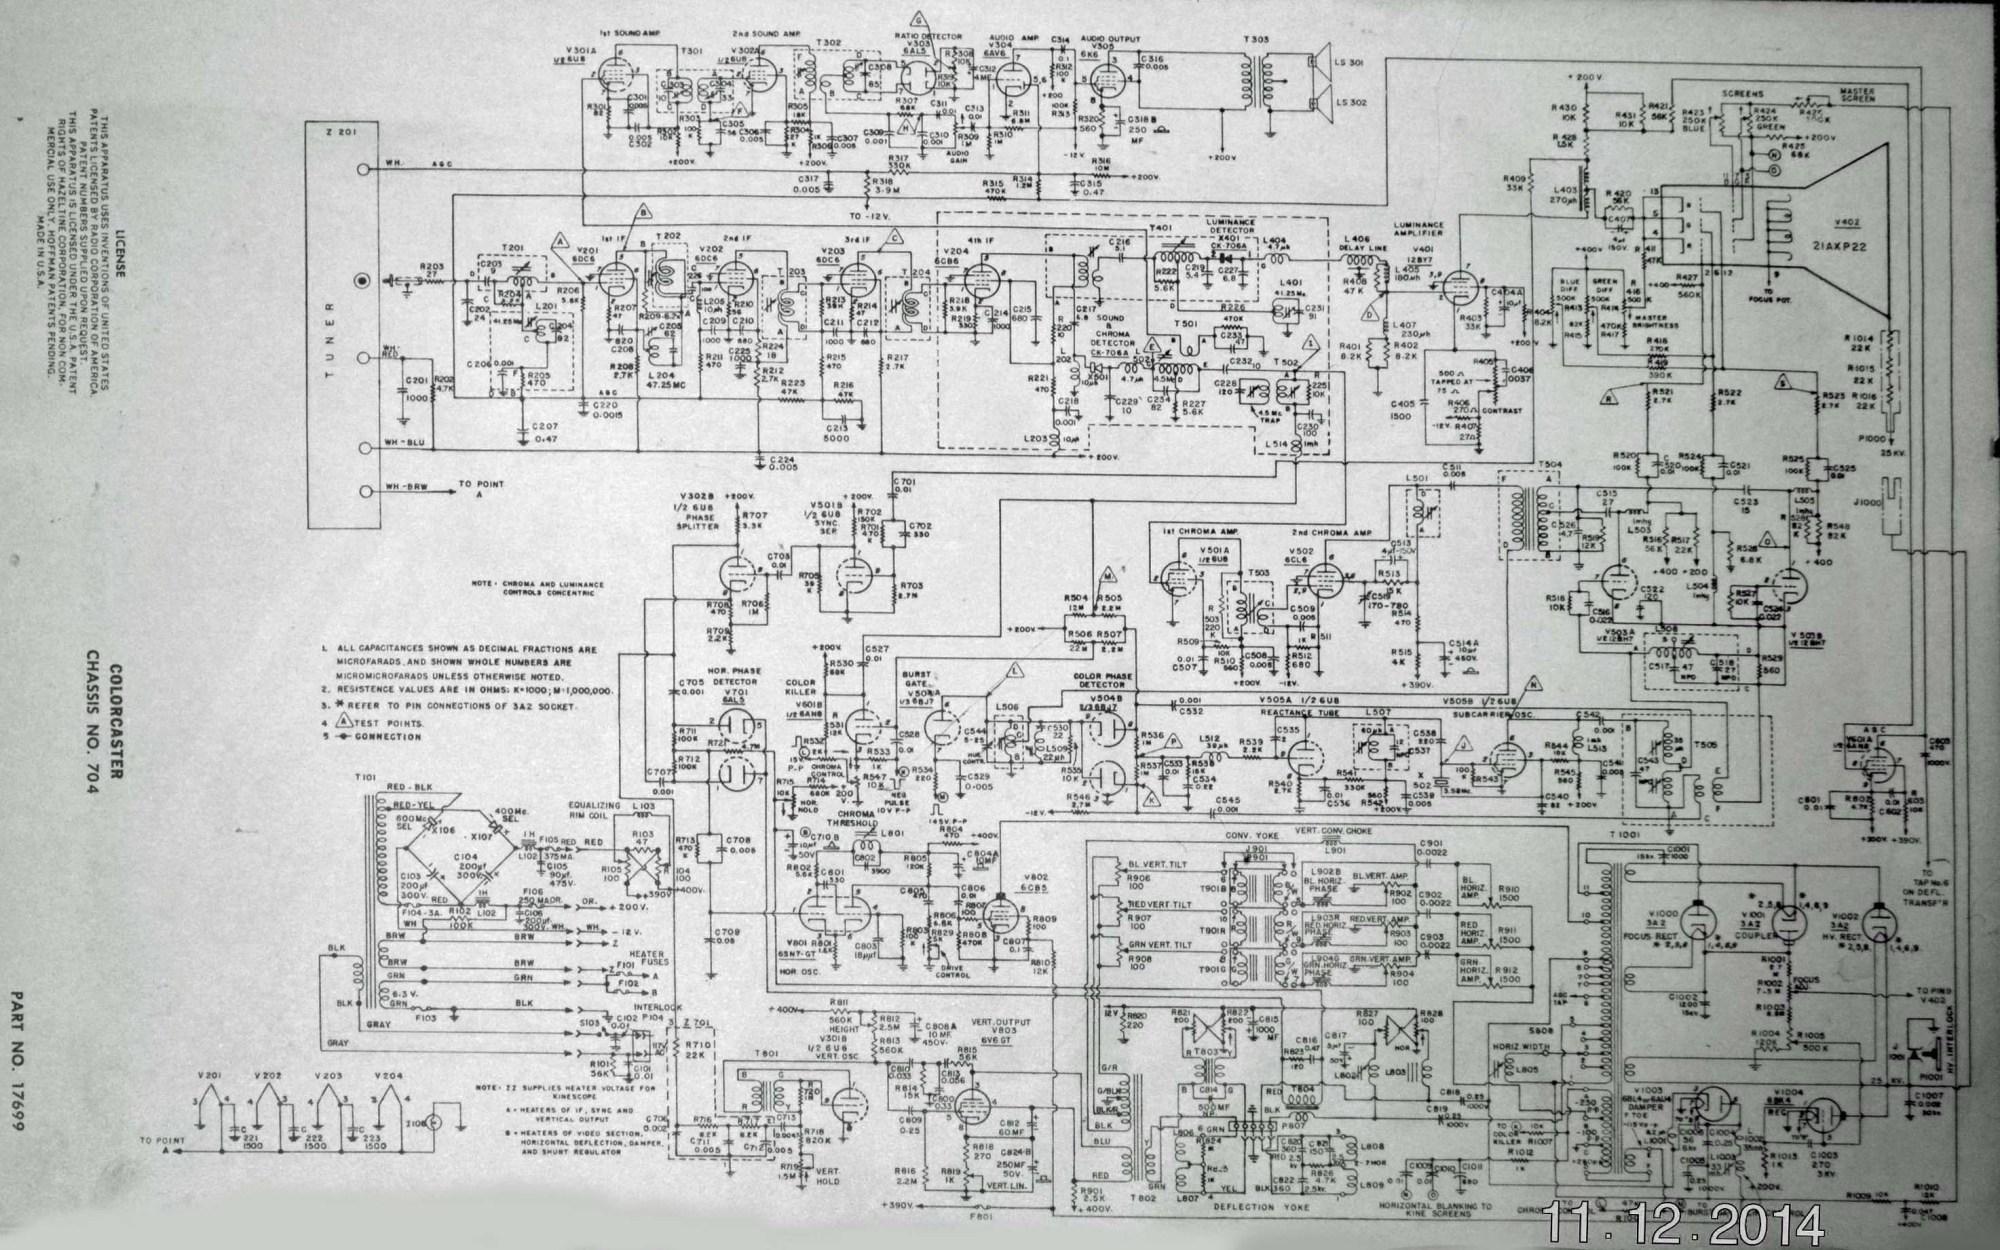 hight resolution of m4041 sams 385 3 38 schematic 35